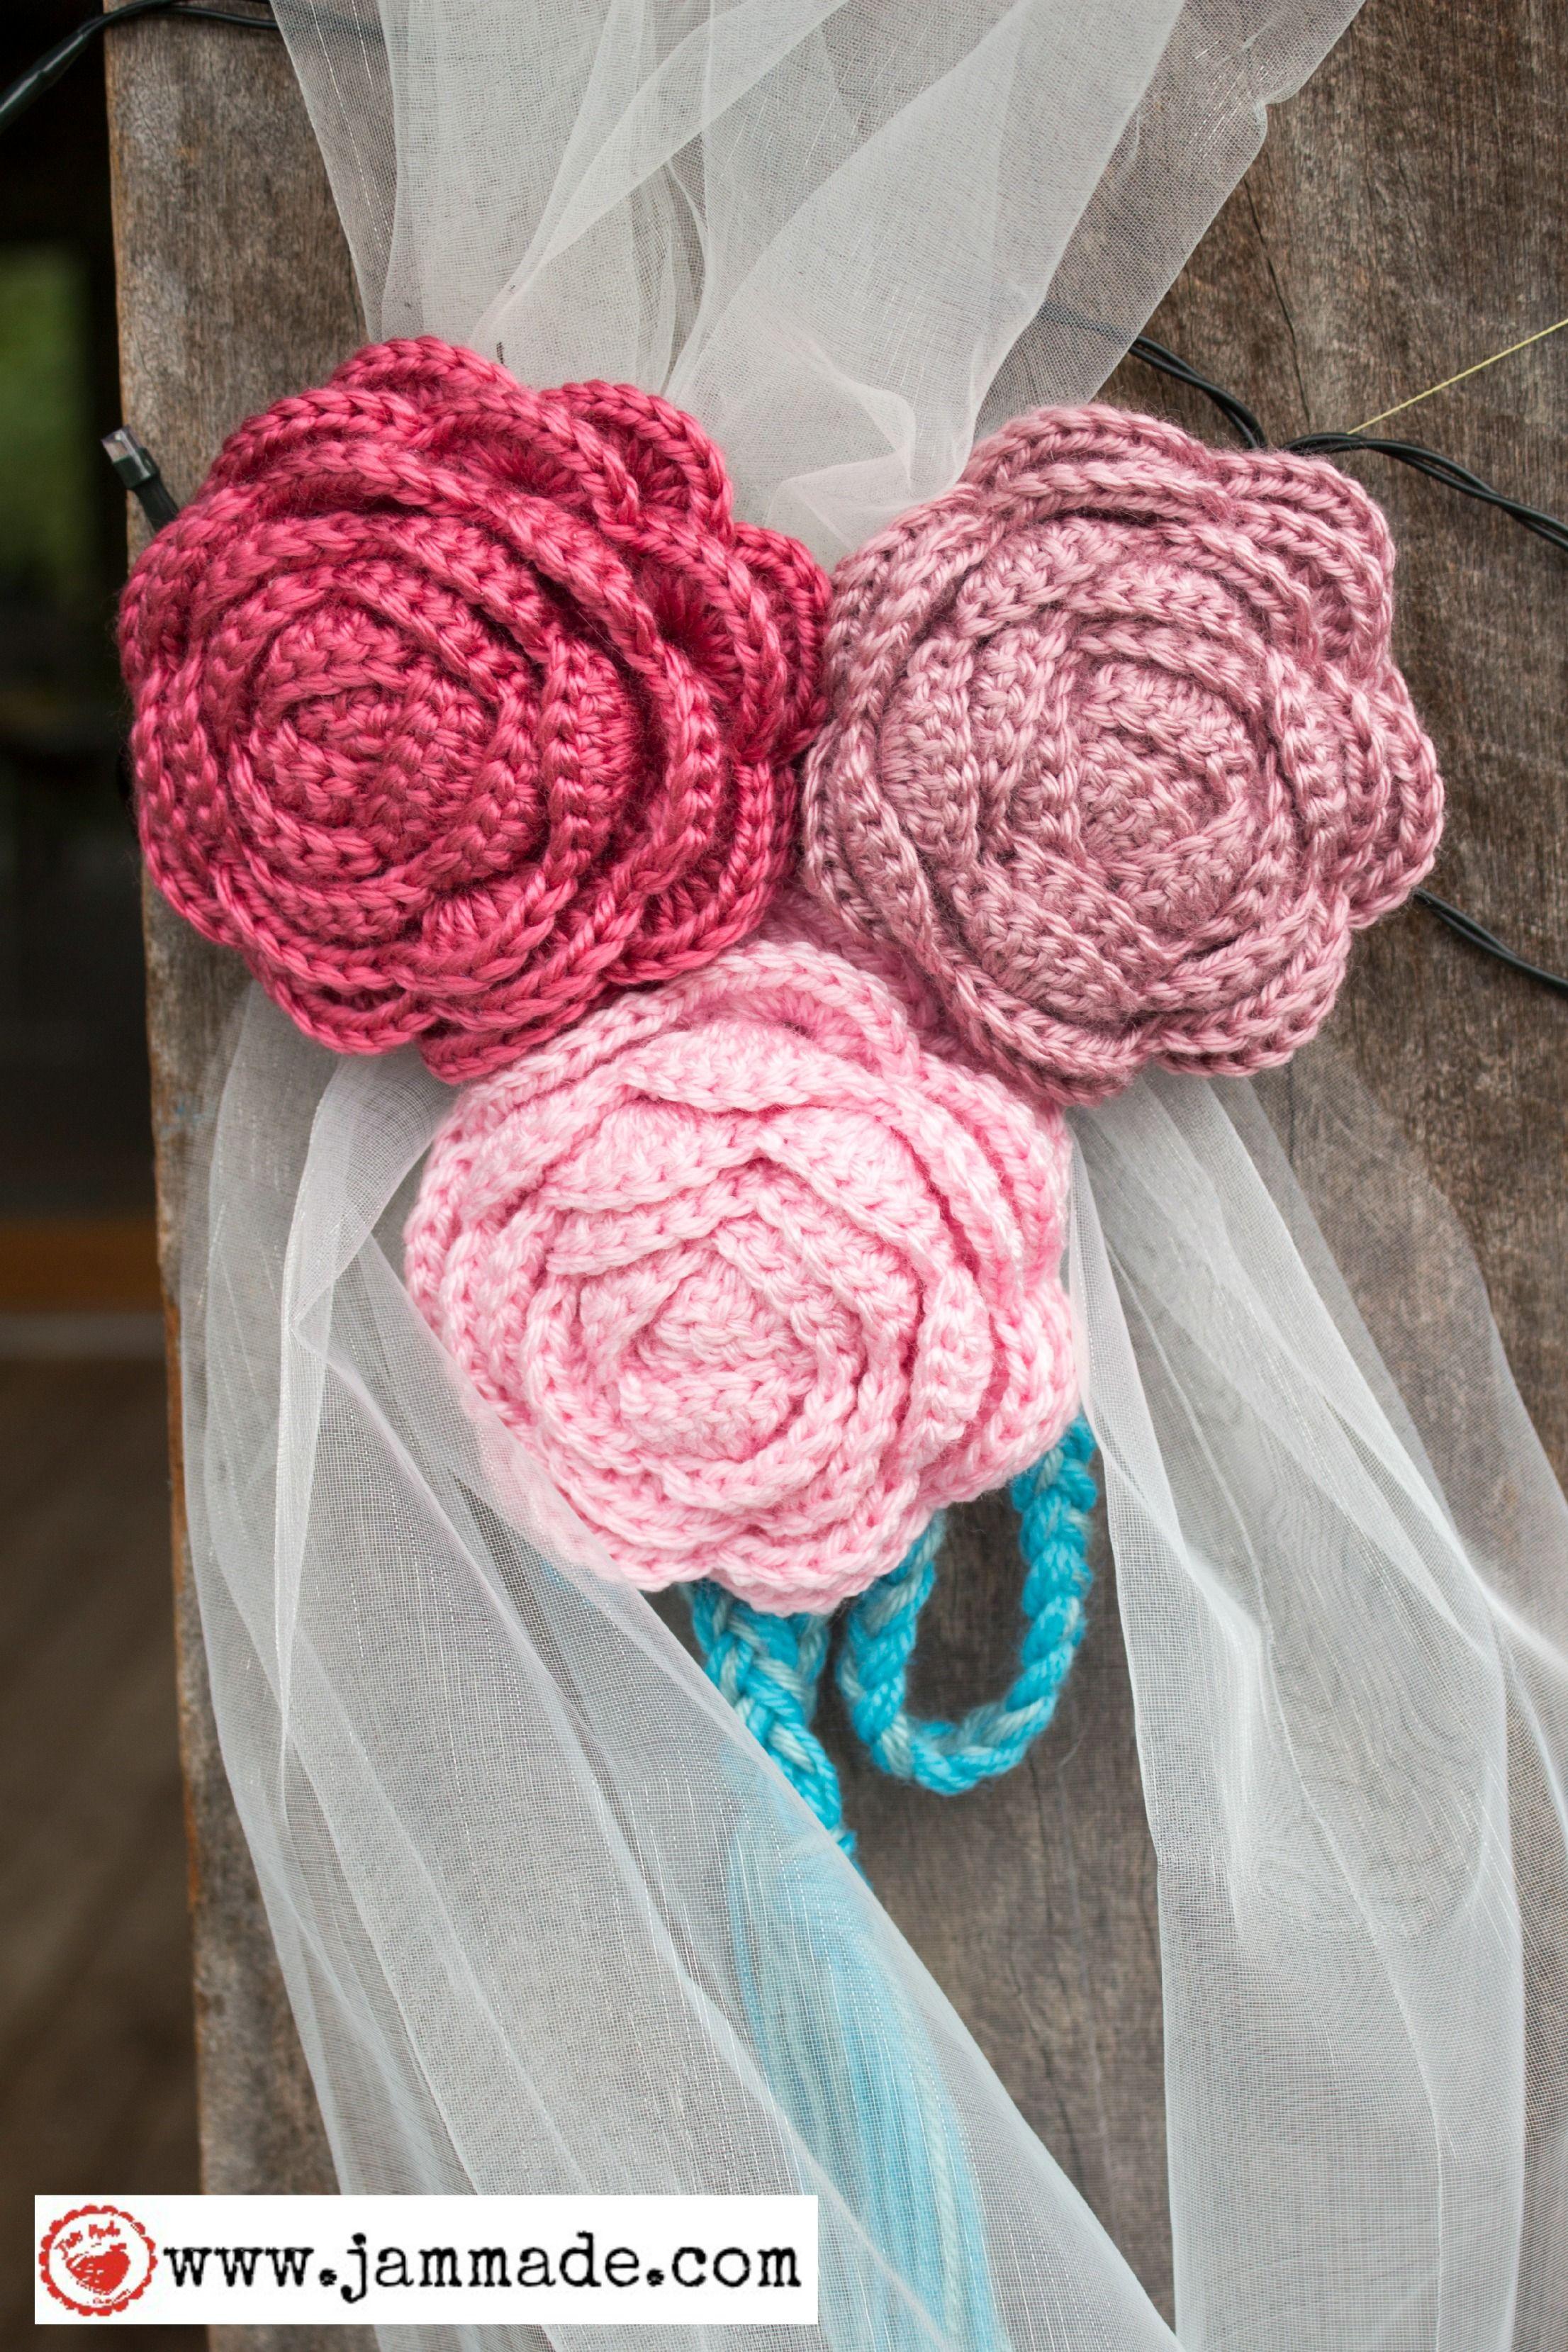 Jam made wedding - curtain ties   Crochet n Knit   Pinterest ...